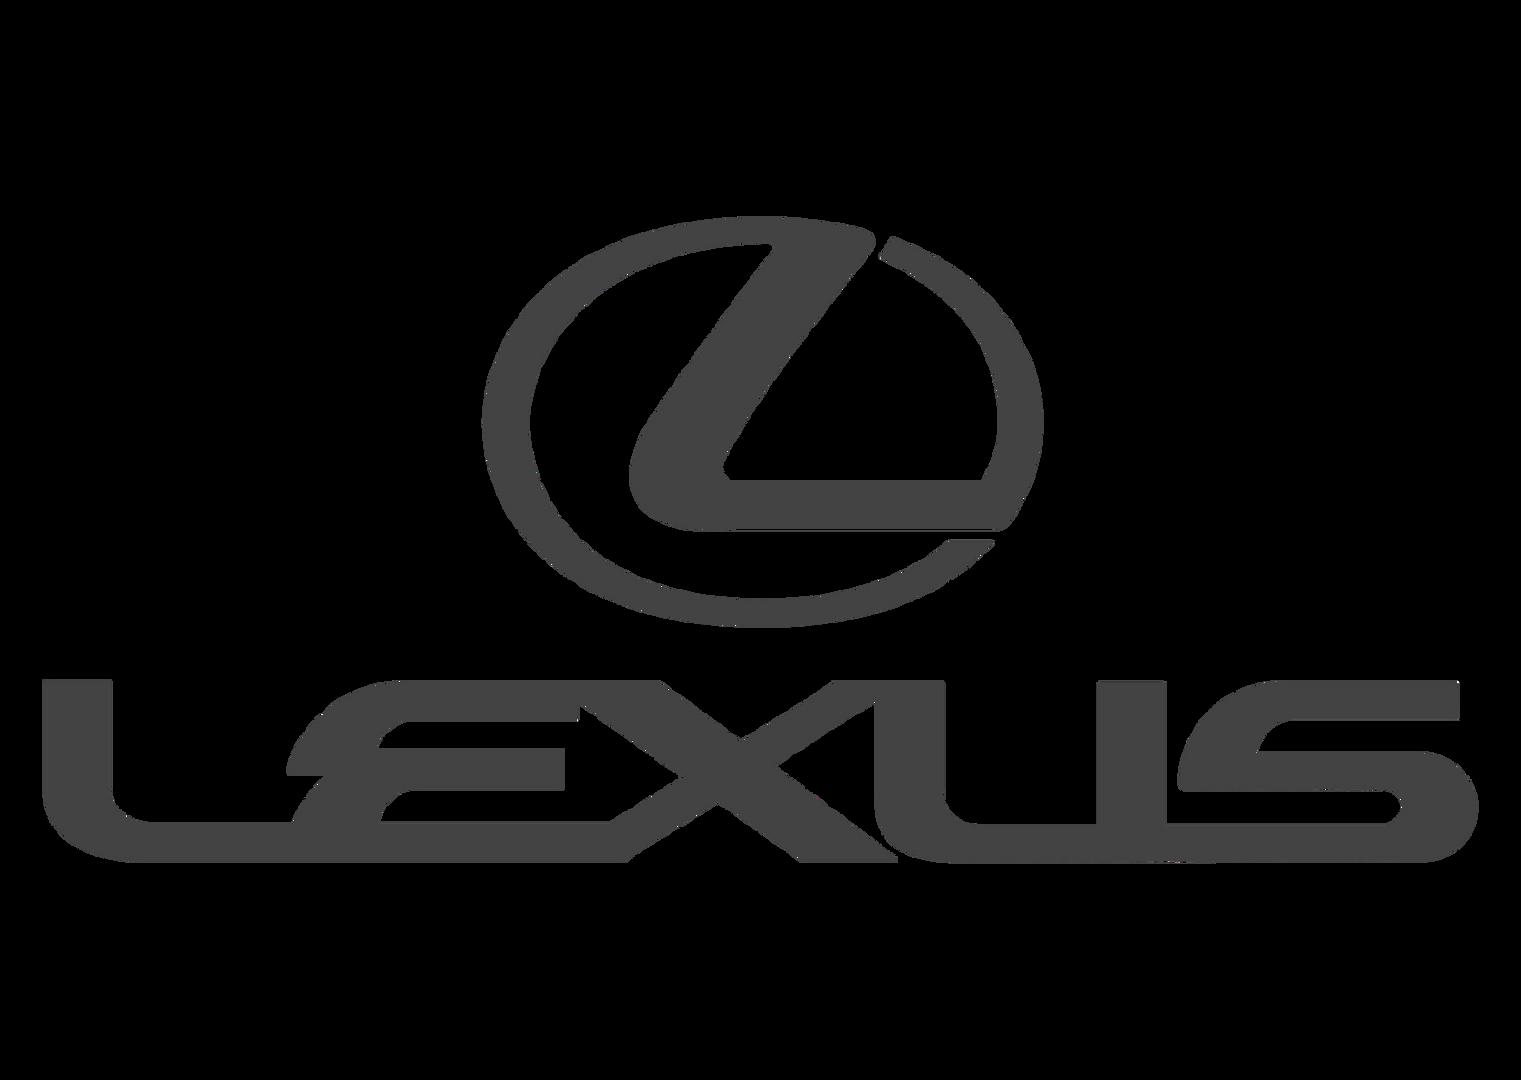 lexus-auto-logo-vector-png-lexus-logo-ve